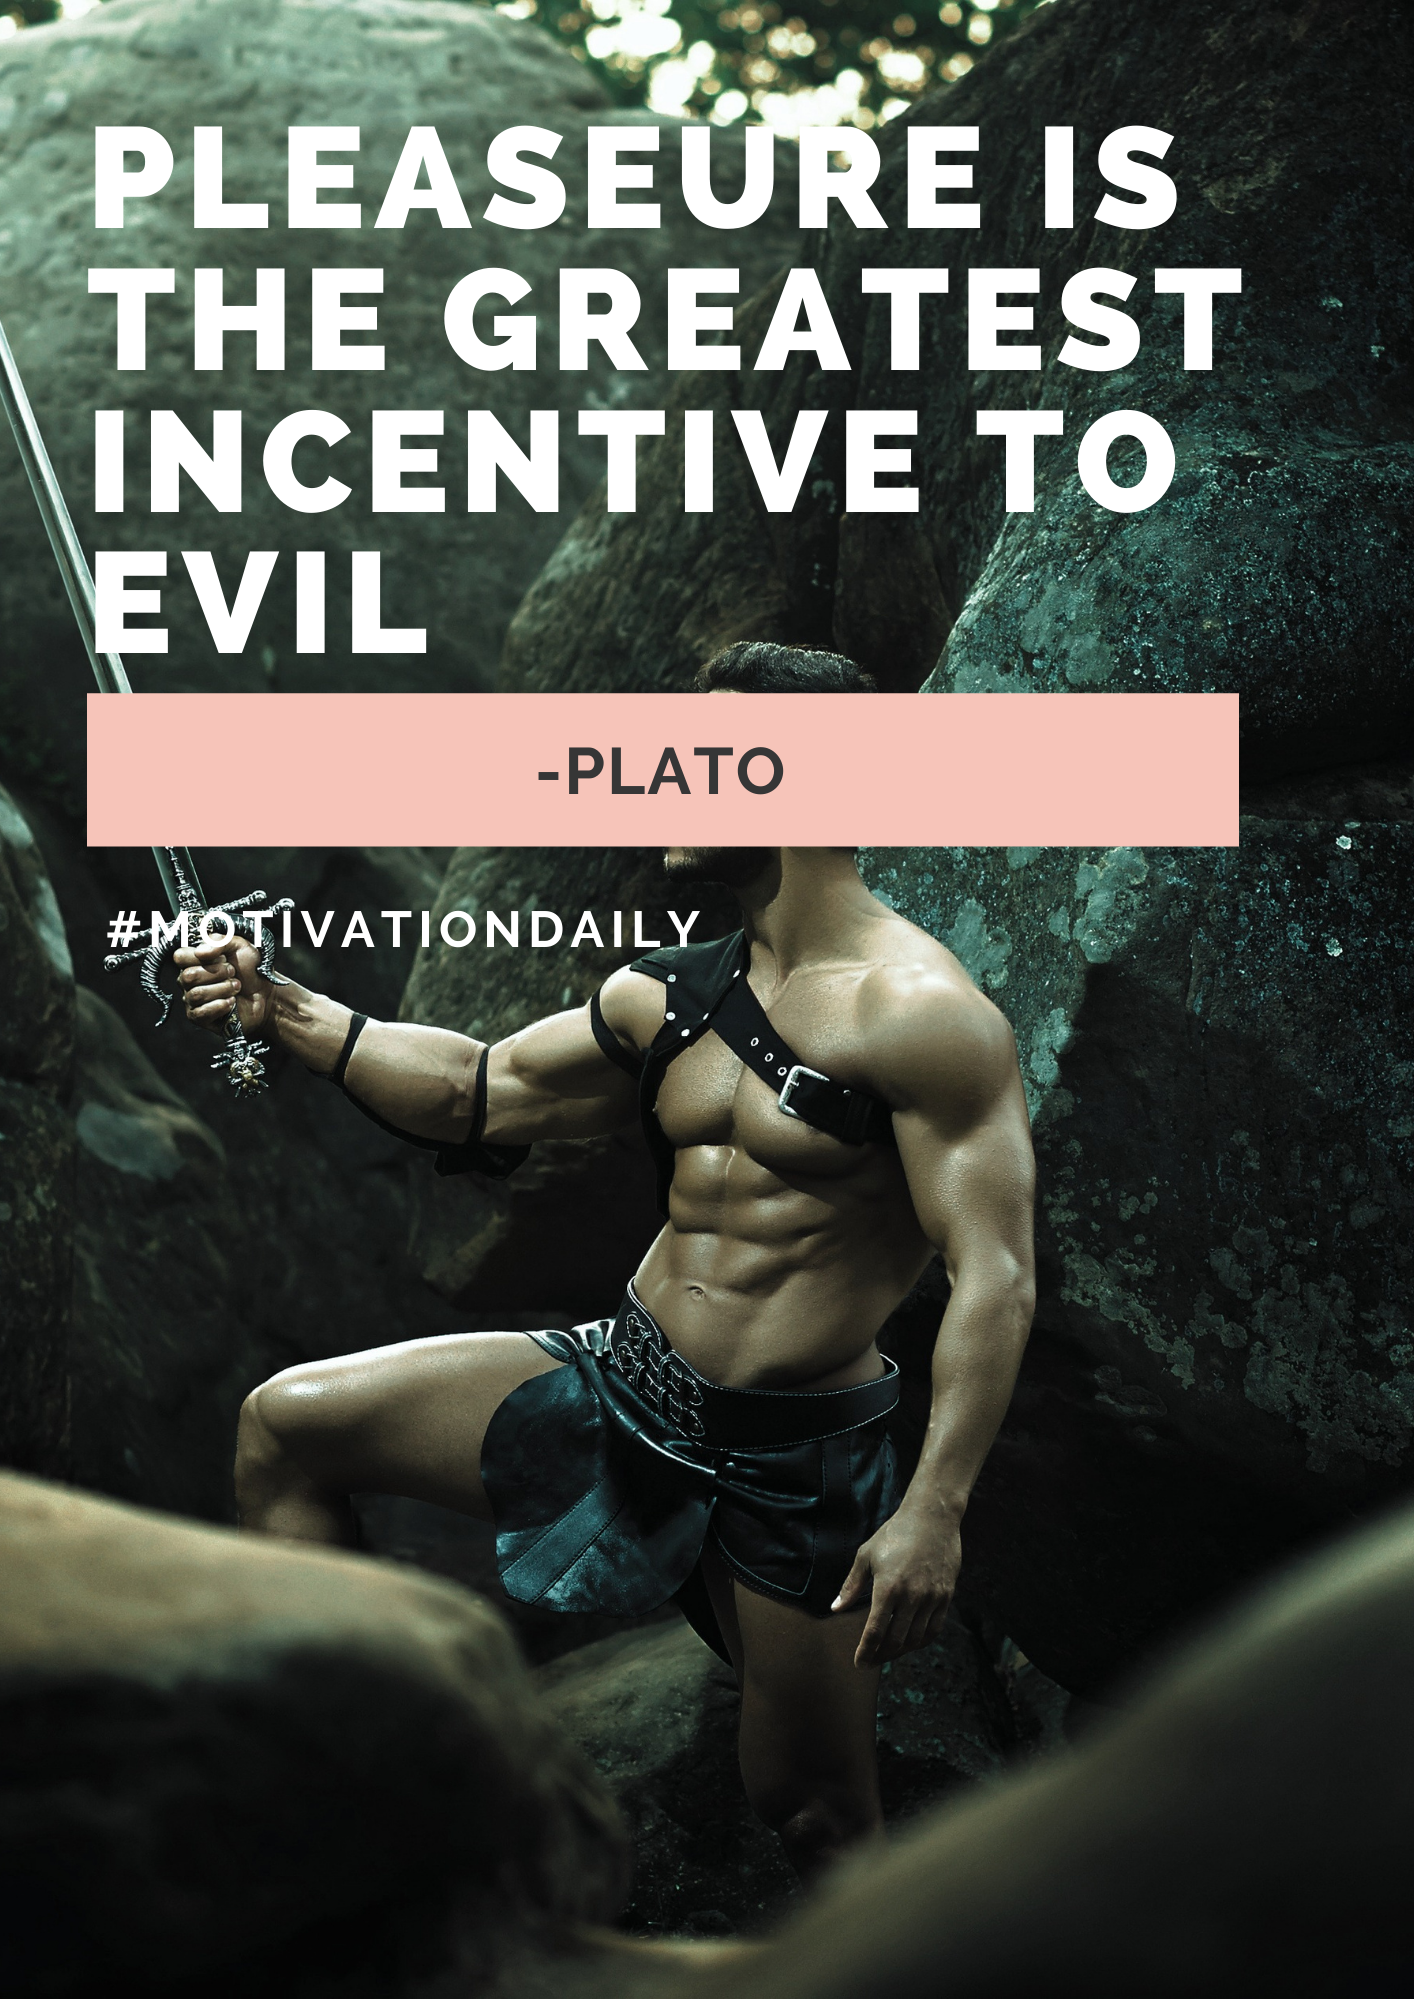 """The Greatest Incentive to Evil."" -Plato 1414 x 2000"